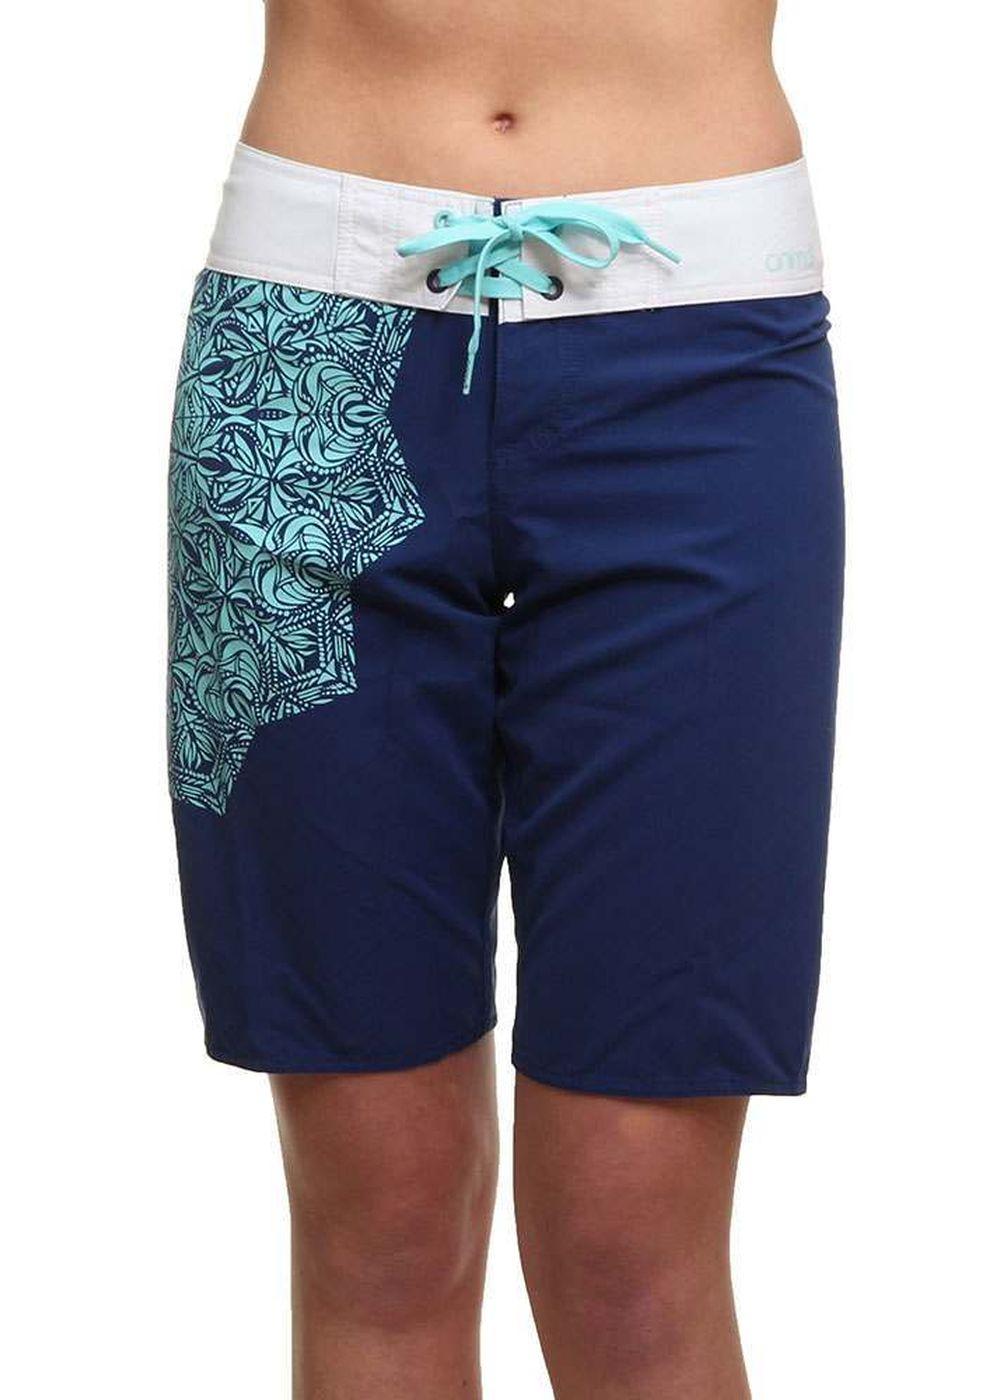 animal-aloha-june-boardshorts-sailor-blue